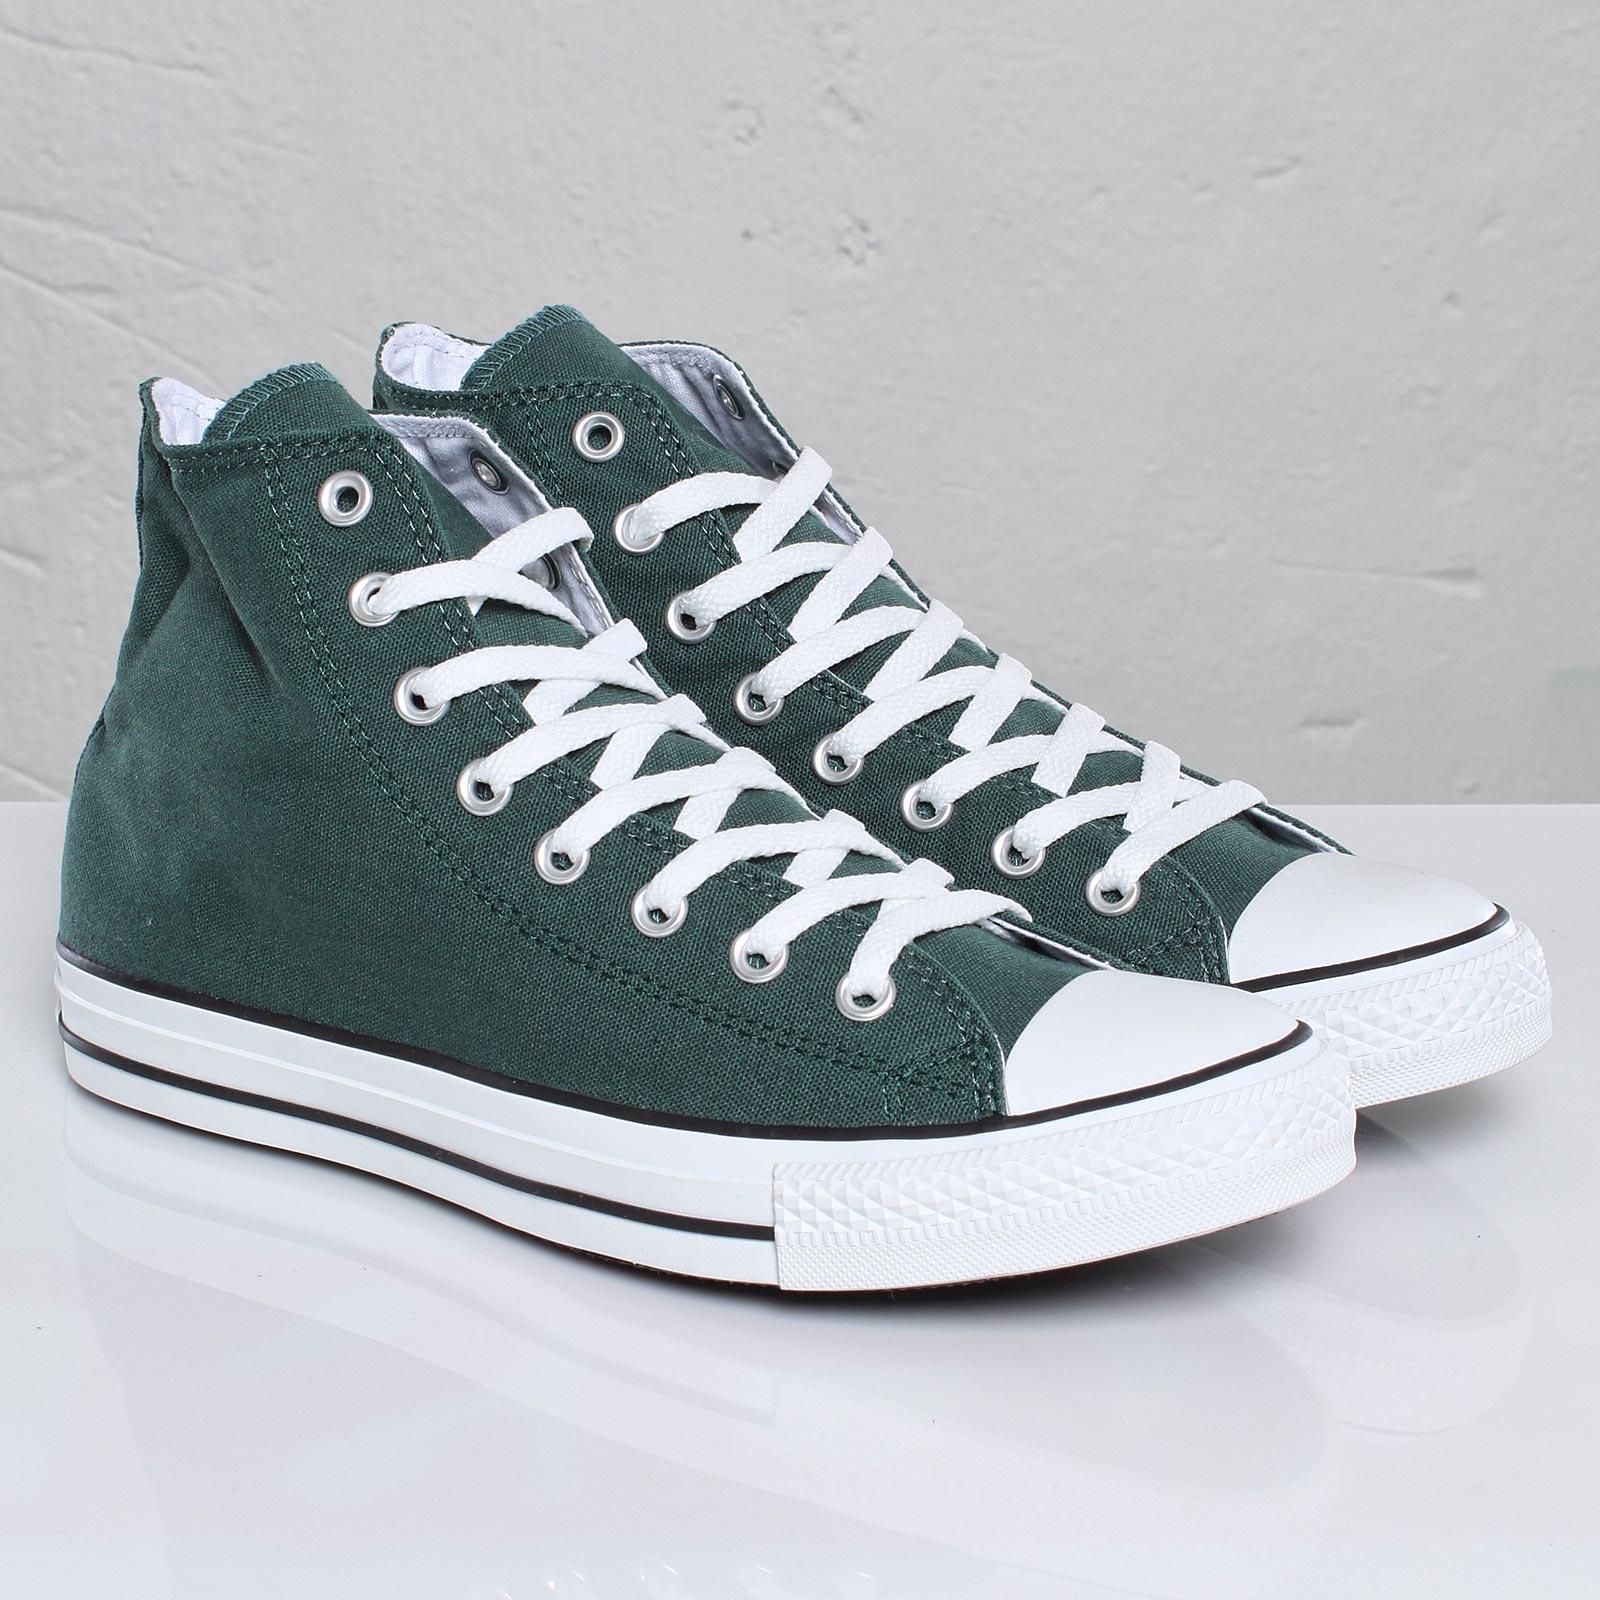 Converse Chuck Taylor Speciality Hi 82727 Sneakersnstuff